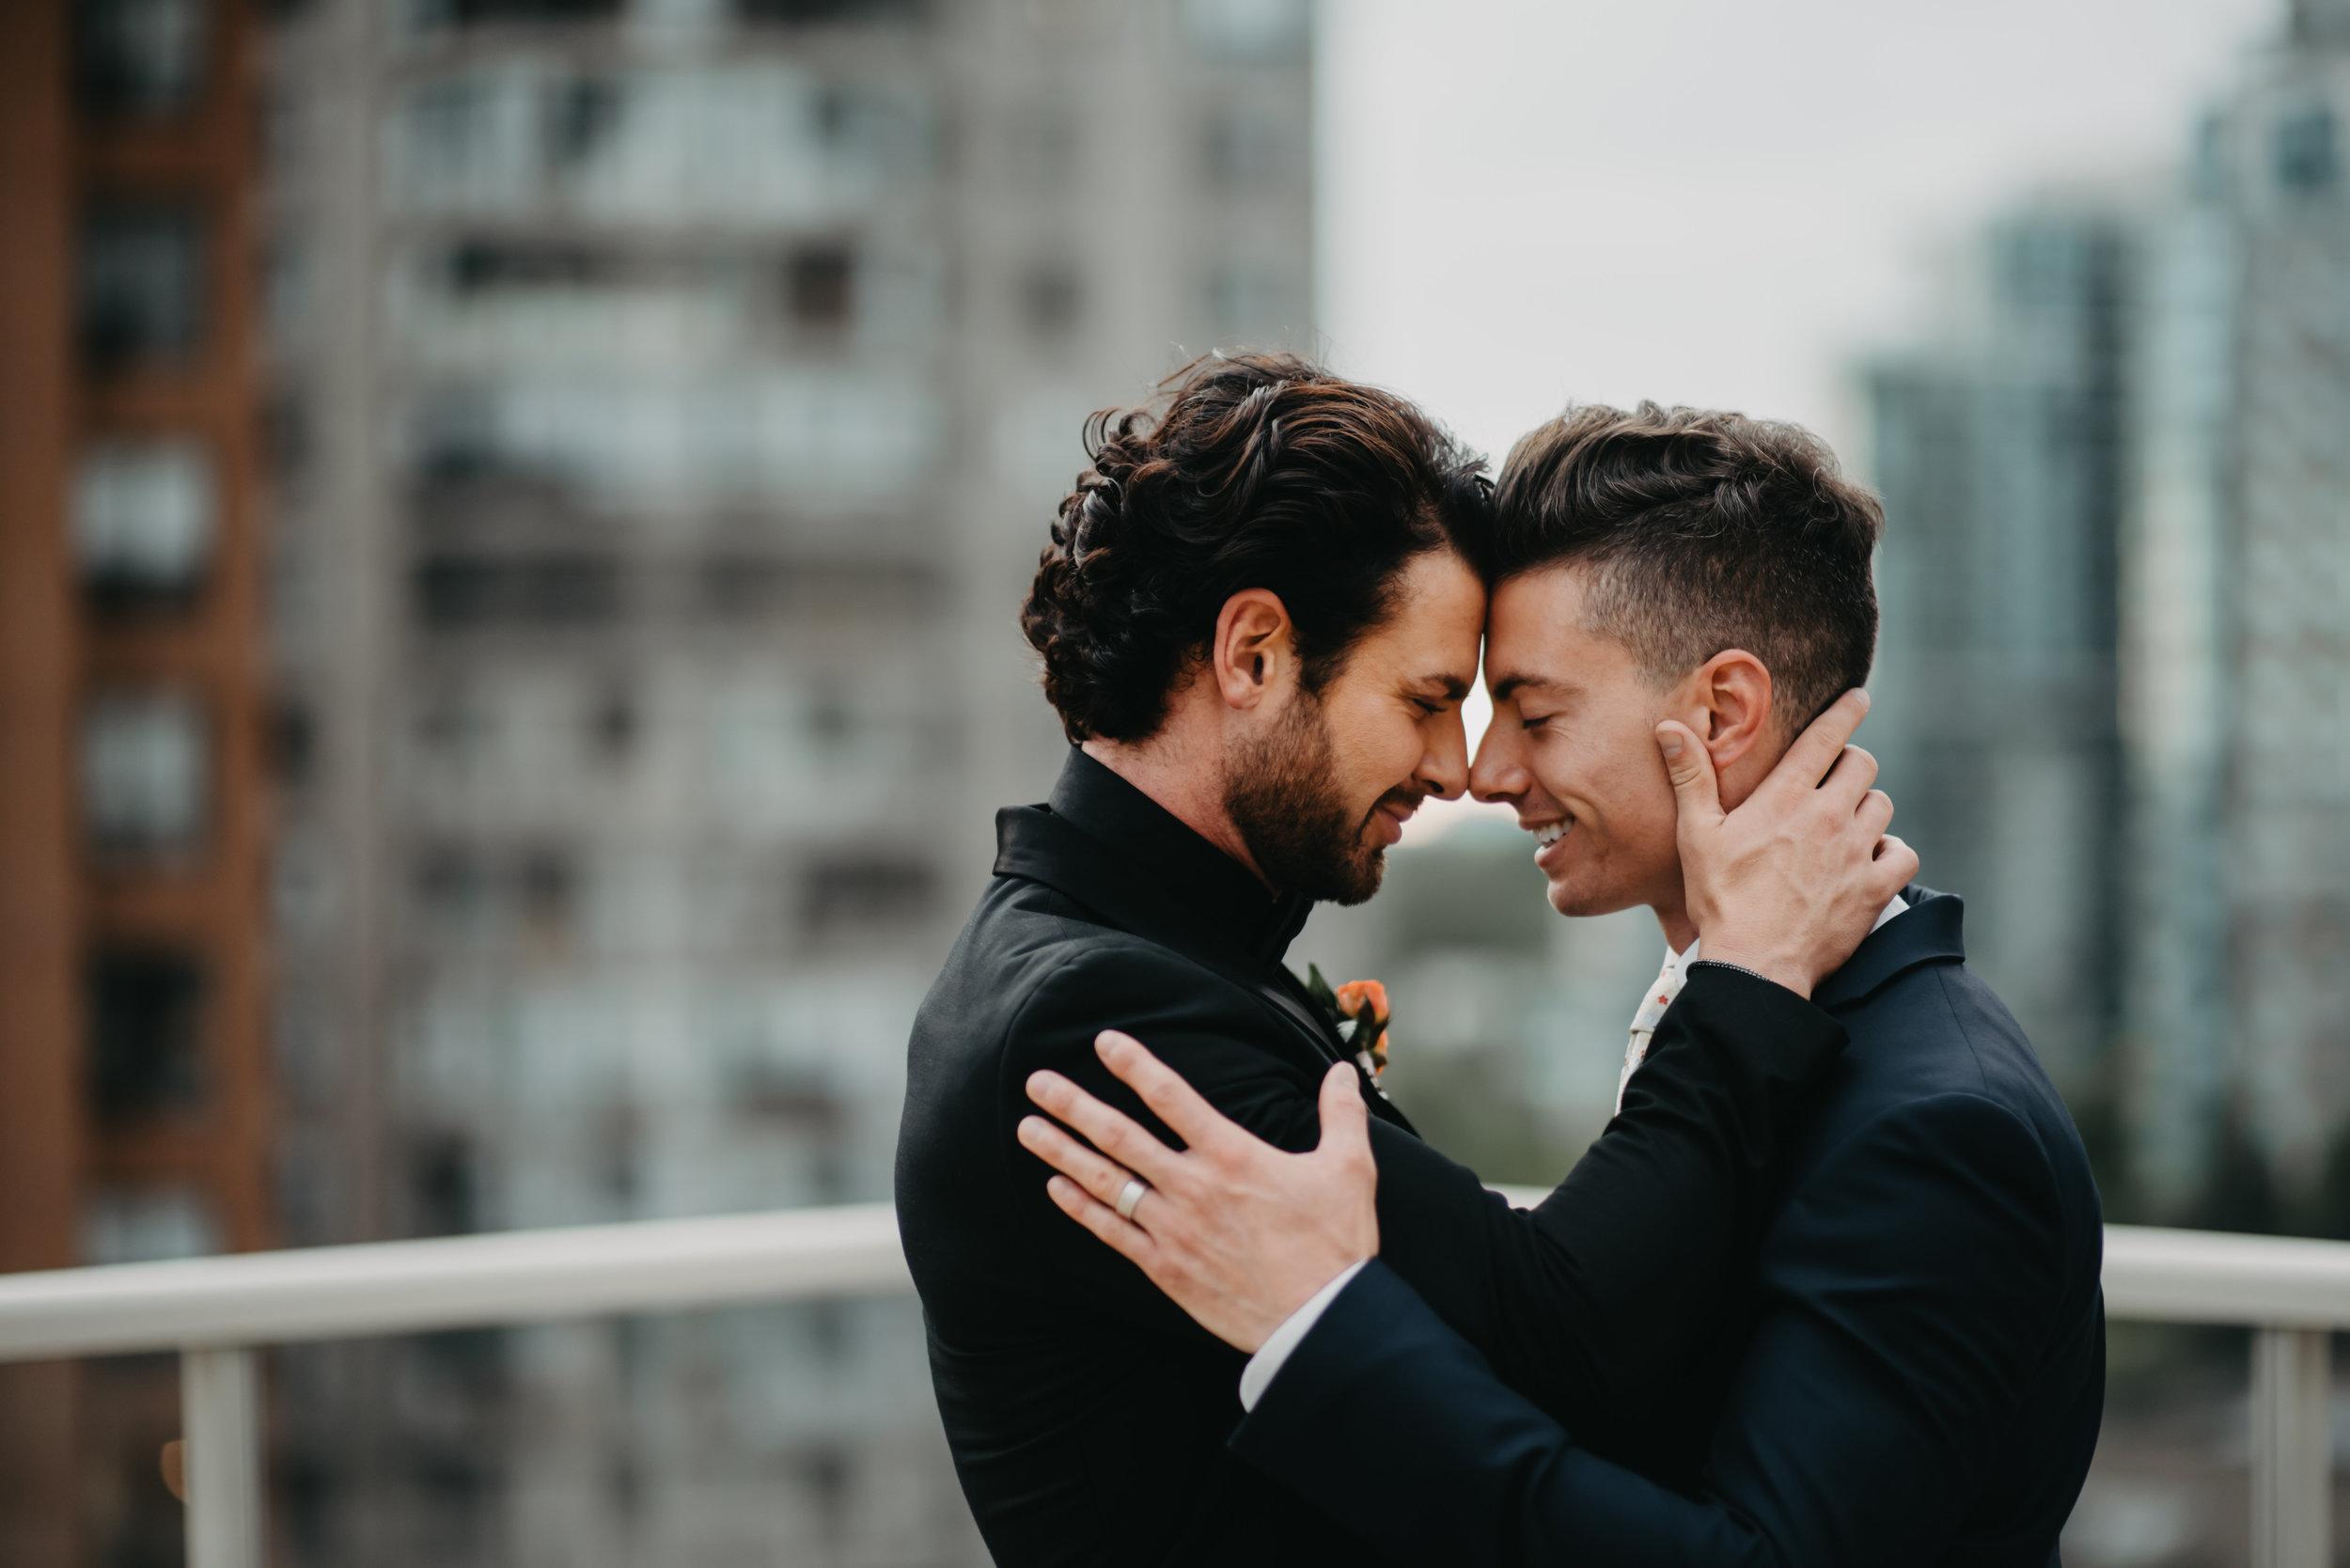 Gay_Toronto_Photoshoot-83804.jpg